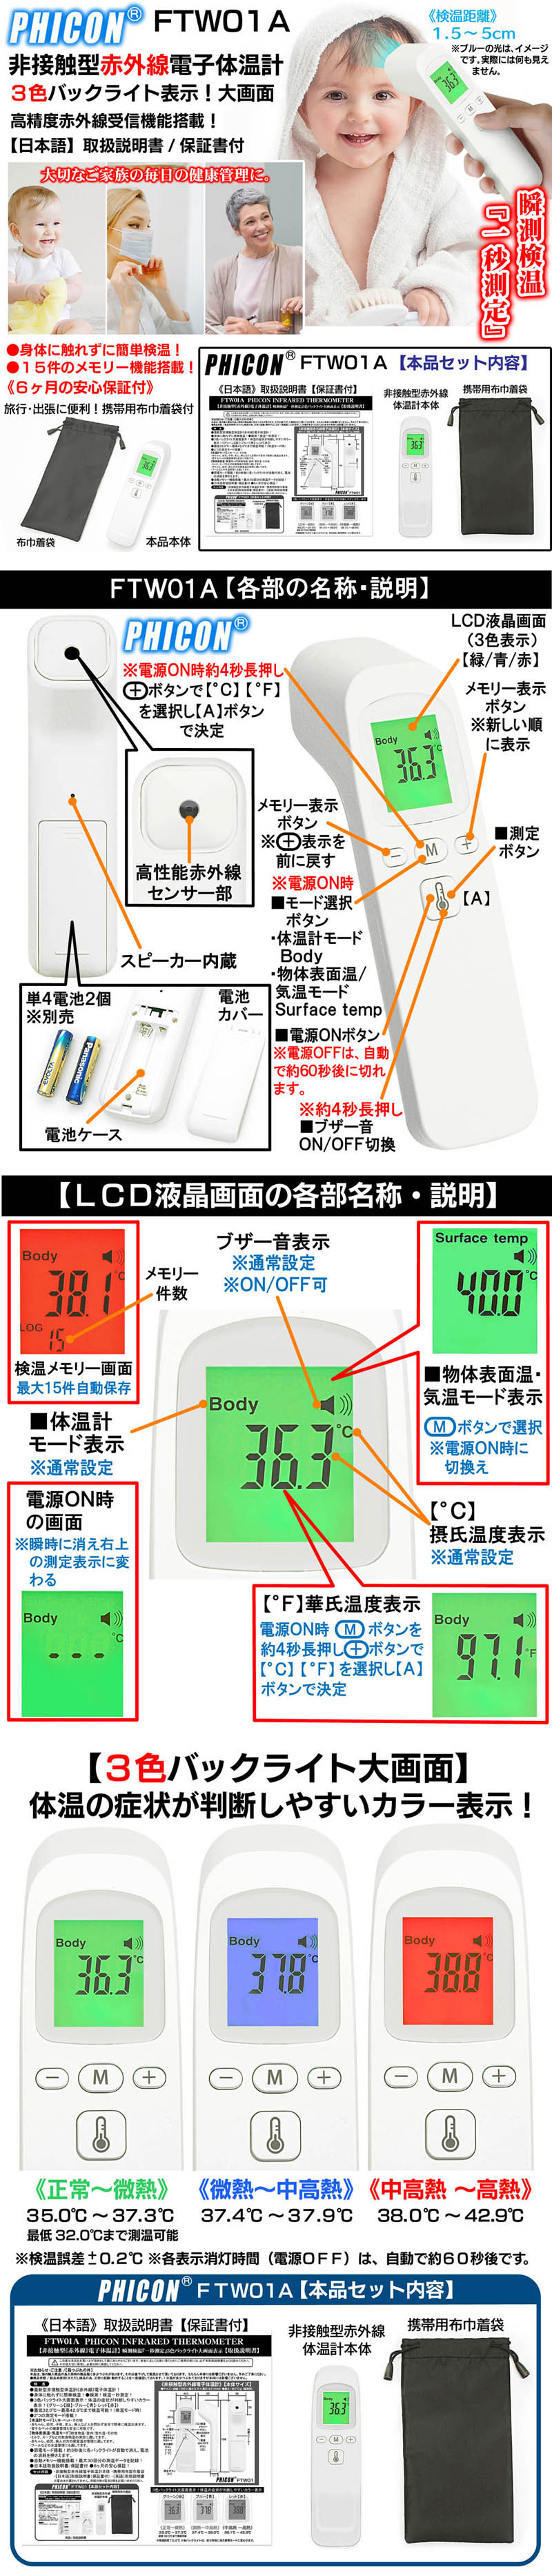 FTW01A/非接触赤外線電子体温計/高精度一秒測定/大画面3色温度表示/飲食,物体,室内外温測定OK/日本語説明書,保証書,携帯用袋付/6ヶ月保証/PHICON